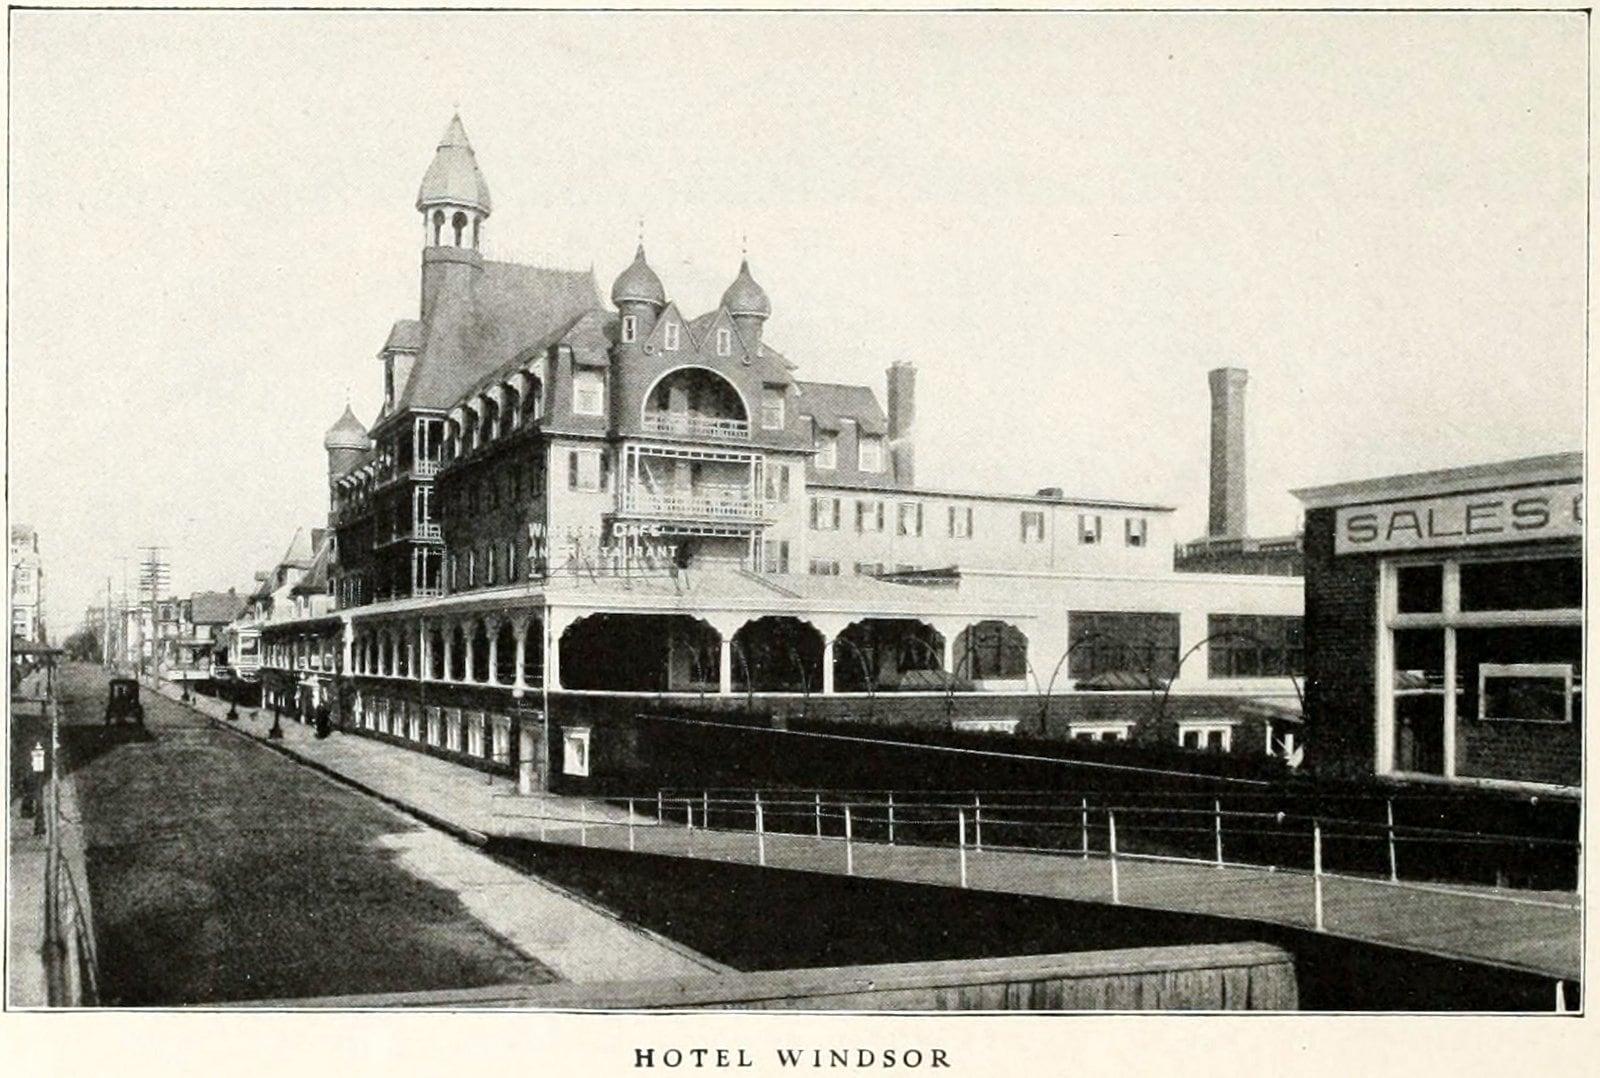 Hotel Windsor - Old Atlantic City (1911)